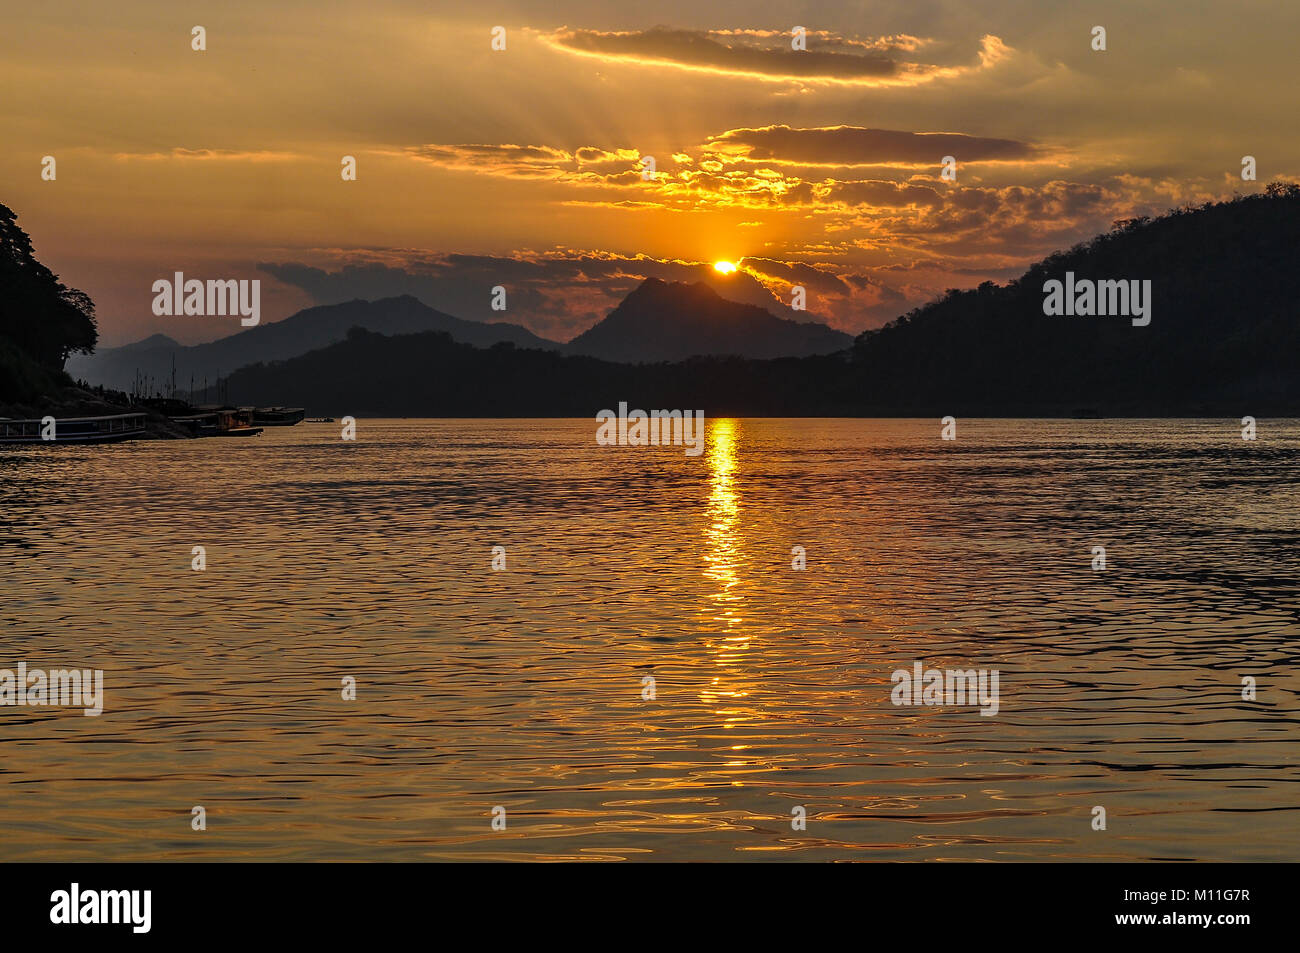 Sunset on the Mekong River in UNESCO World Heritage Luang Prabang, Laos Stock Photo